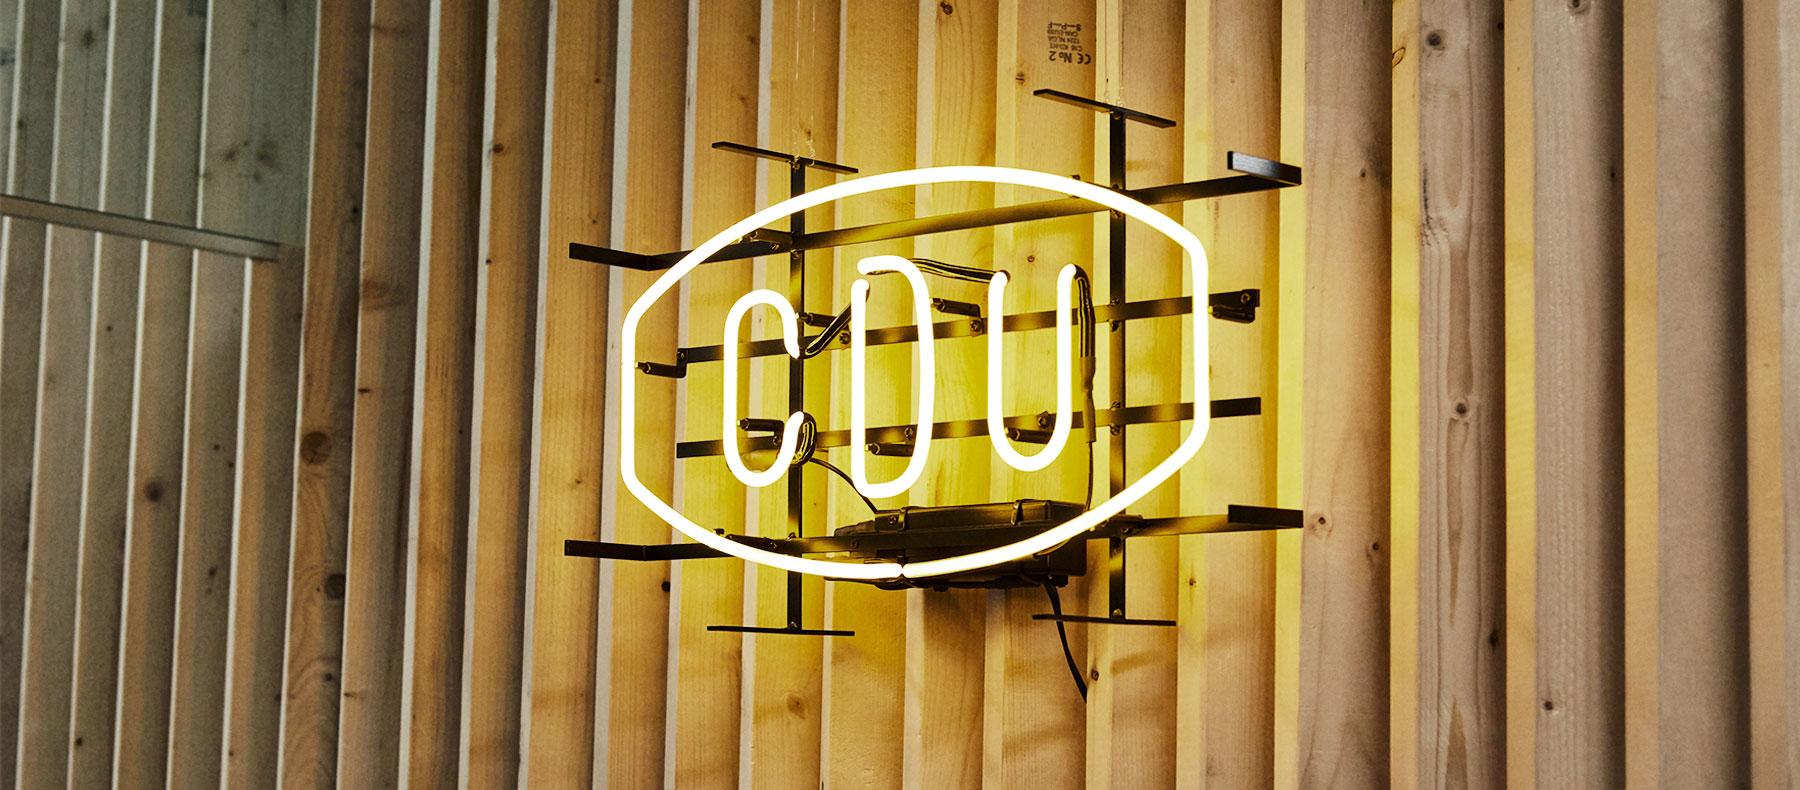 CDU入口付近のネオンサイン